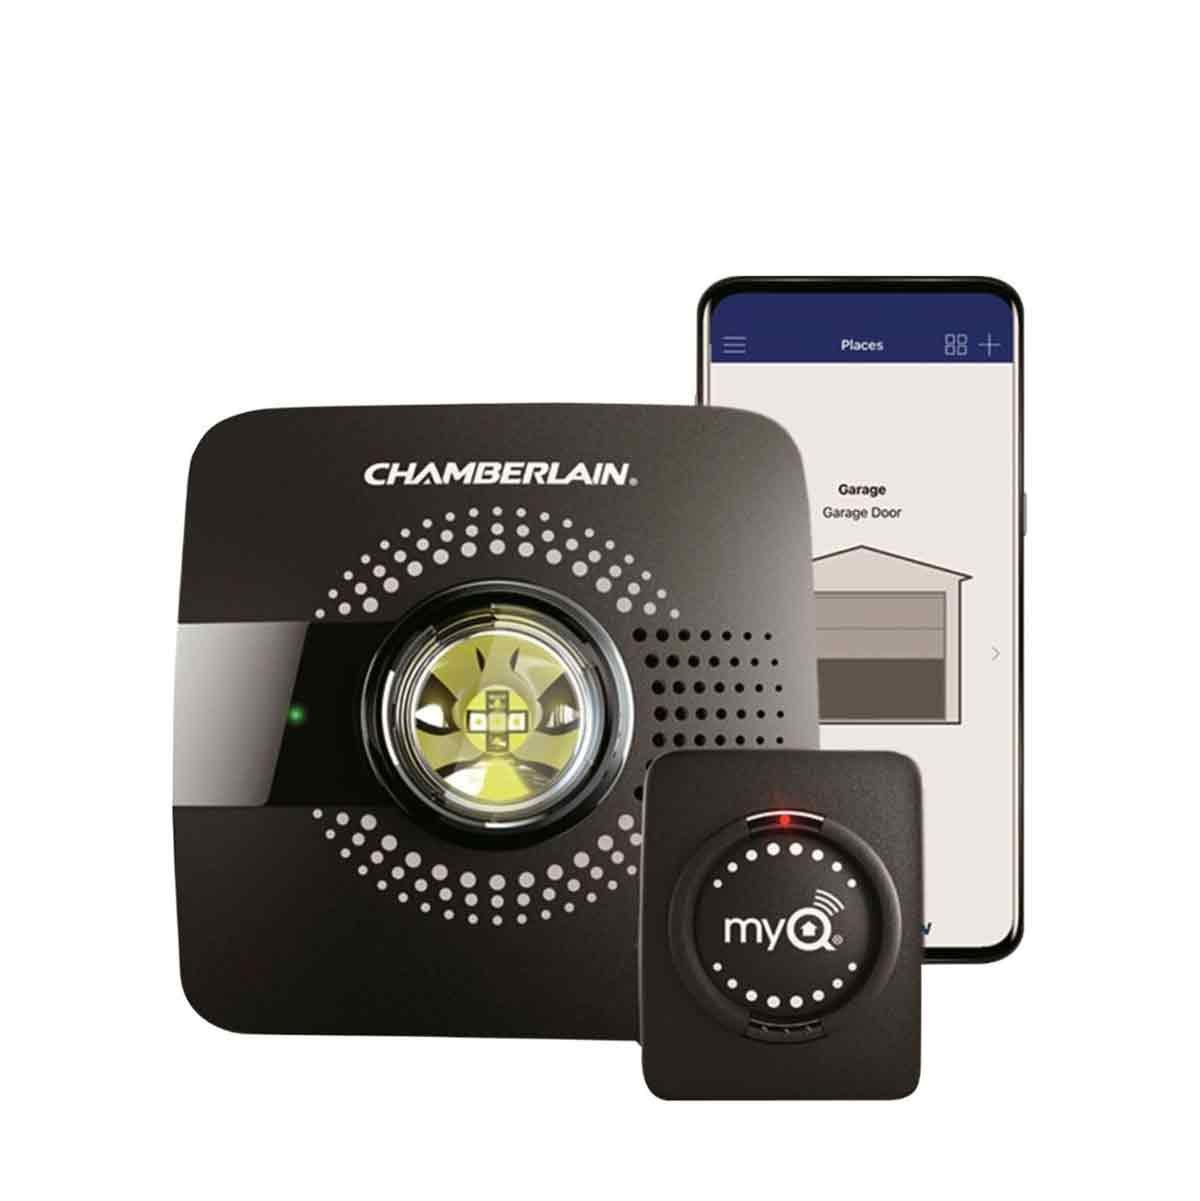 Chamberlain-MyQ-Smart-Garage-Hub